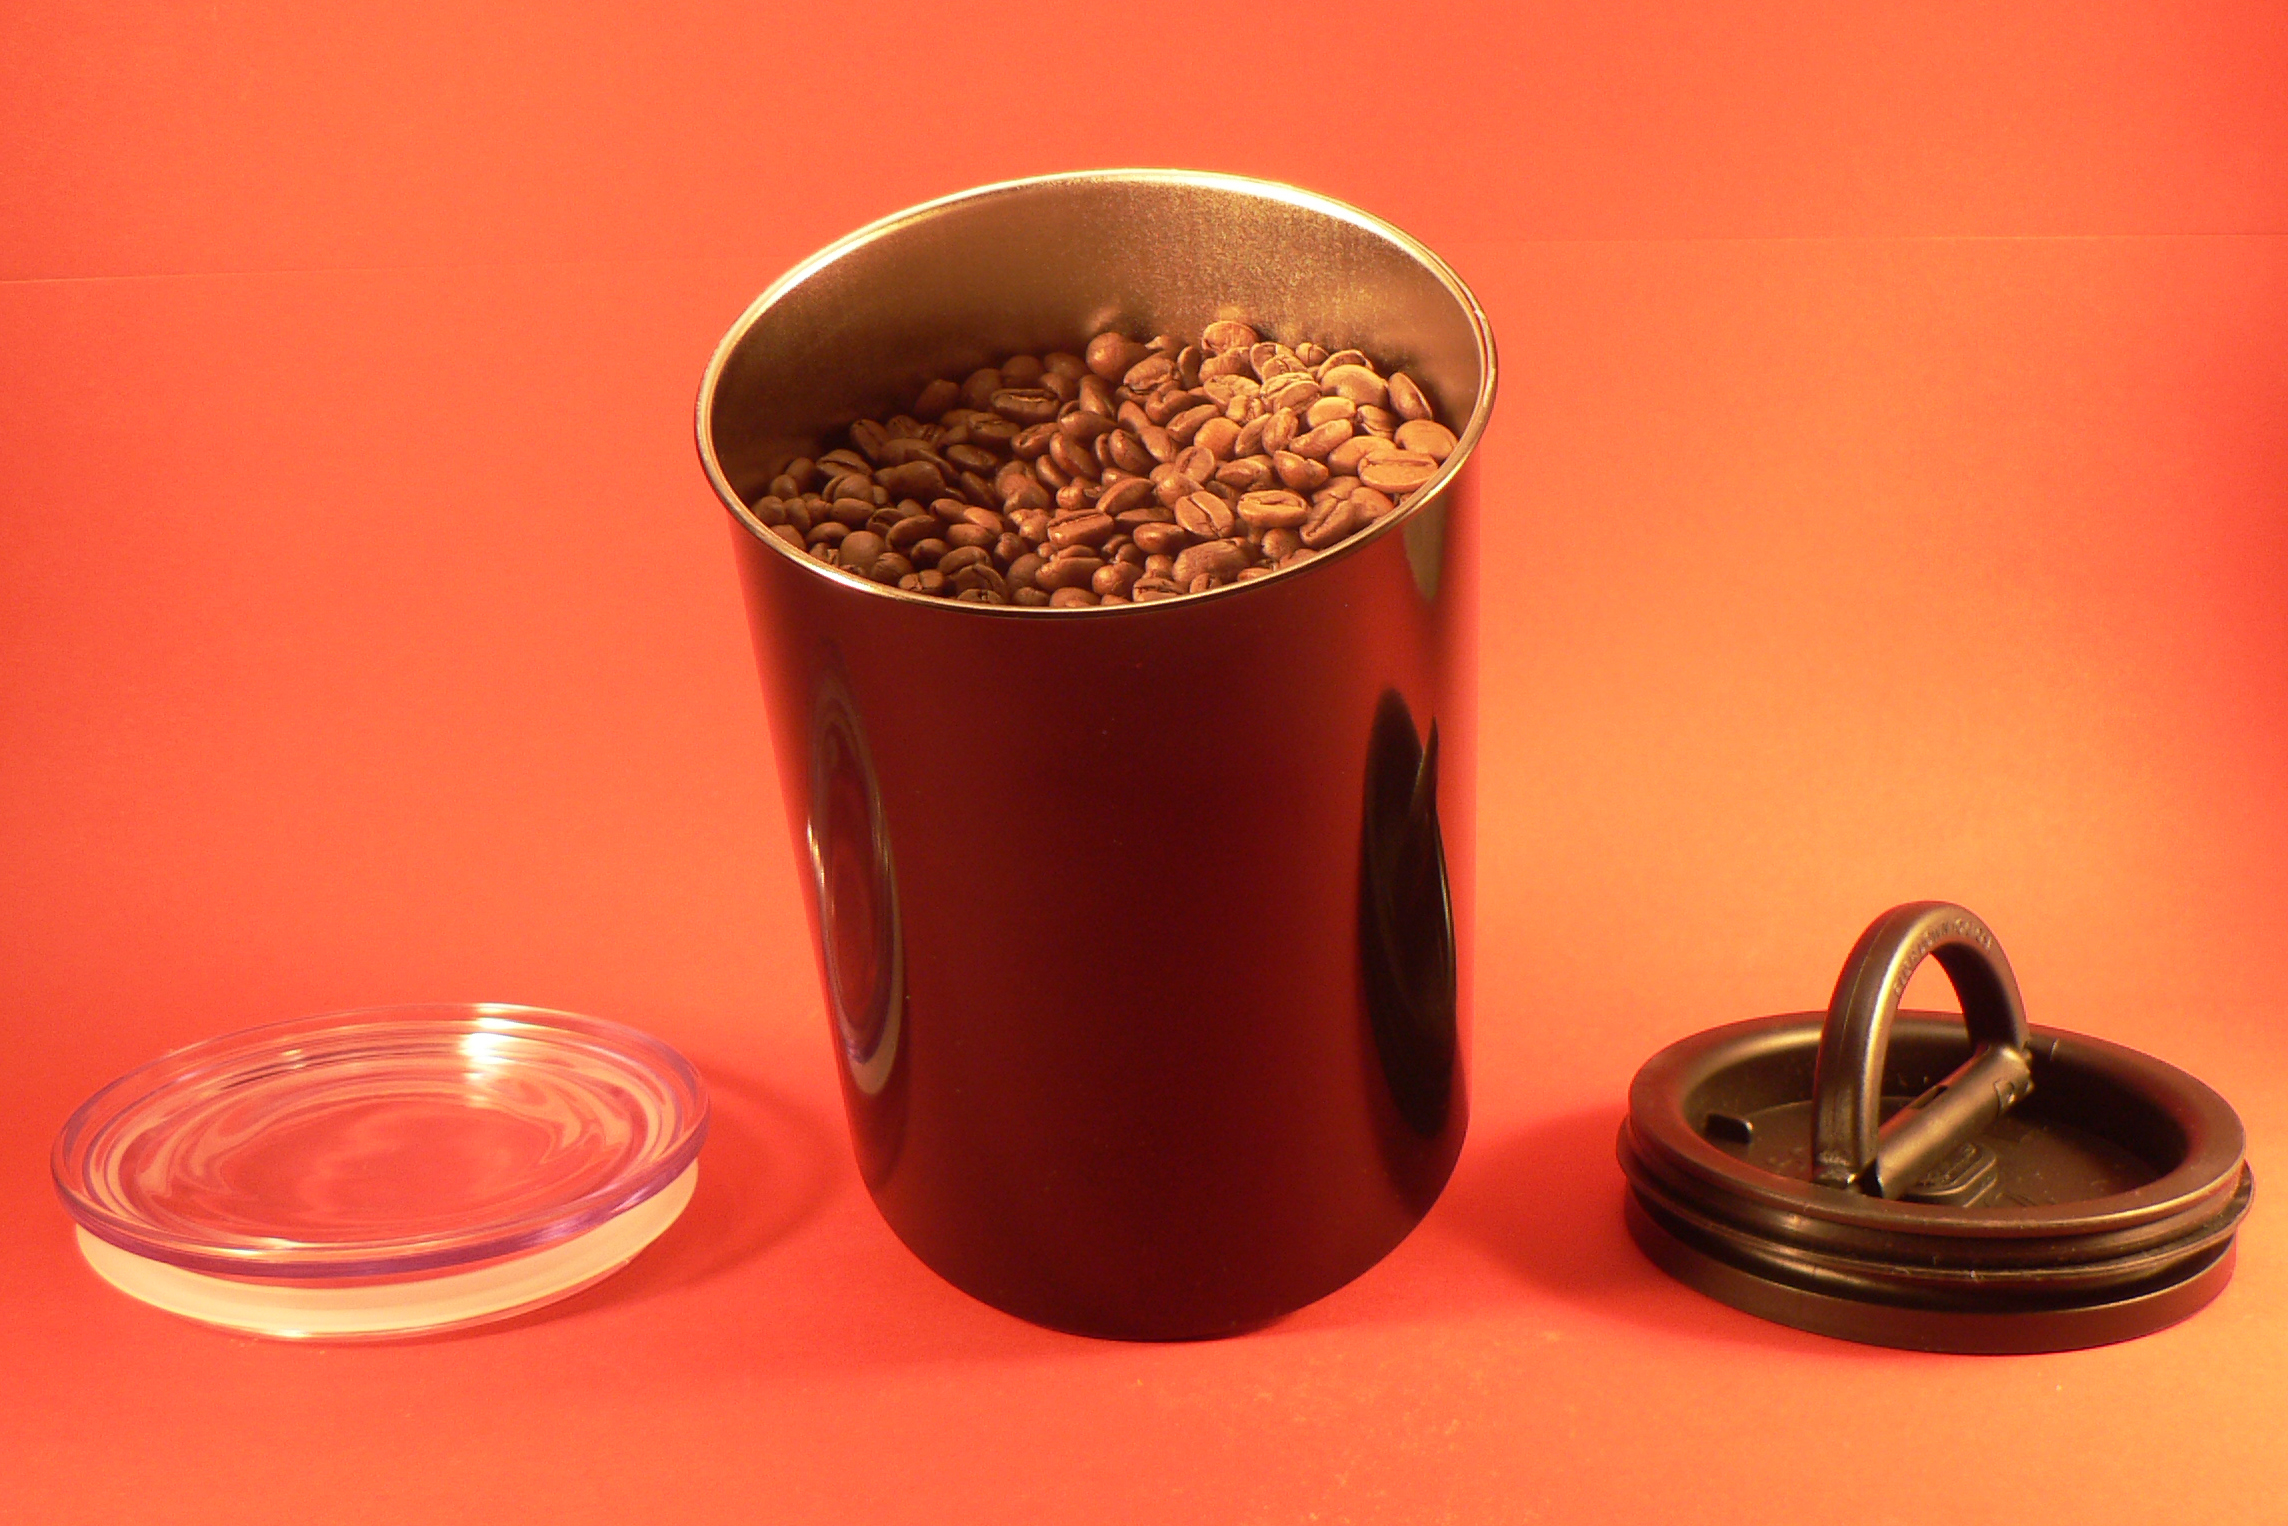 Airscape dóza na kávu 550g Planetary Design - Airscape